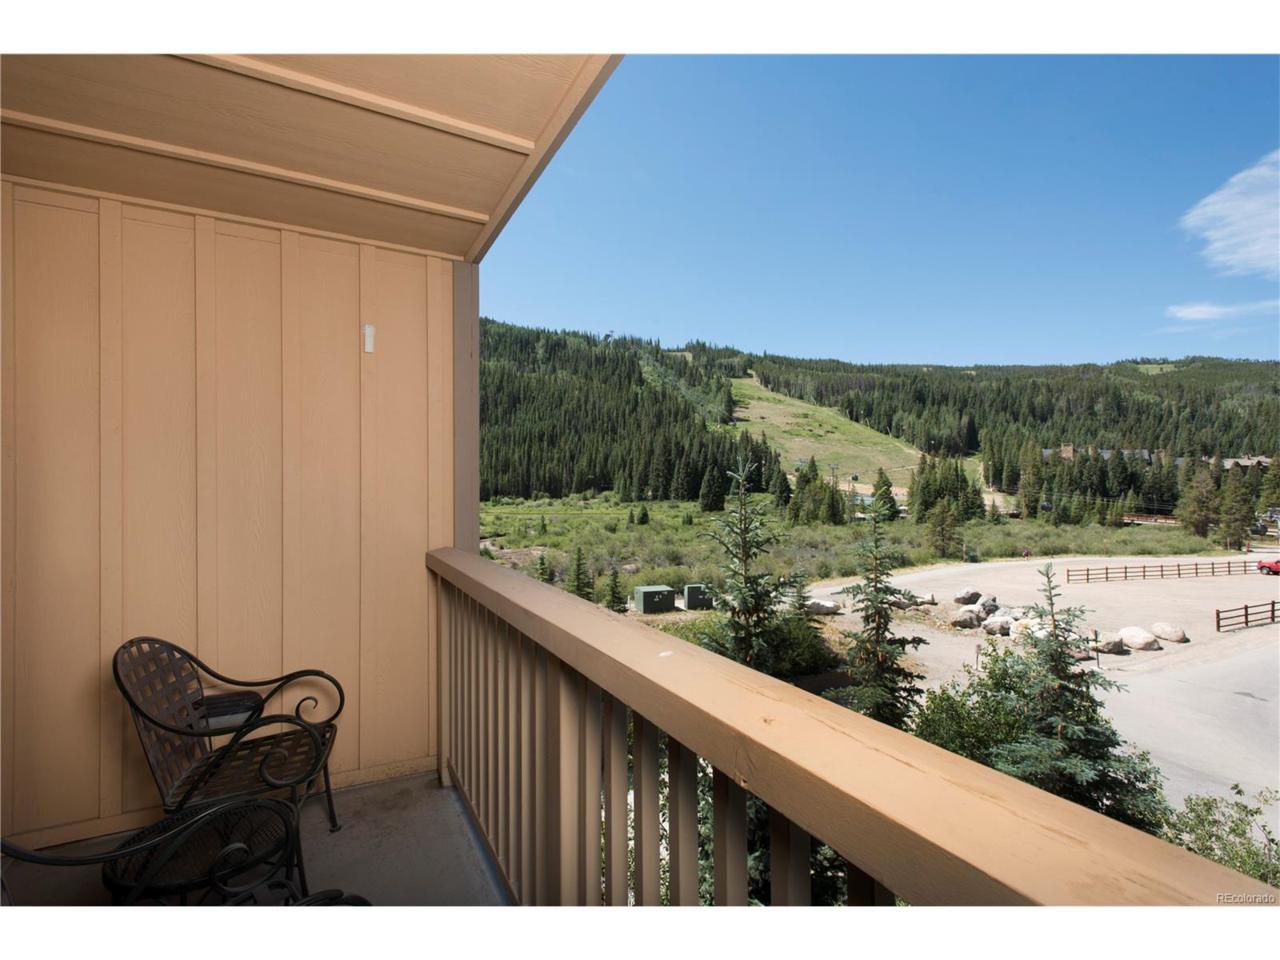 20 Hunki Dori Court #2242, Dillon, CO 80435 (MLS #3682775) :: 8z Real Estate